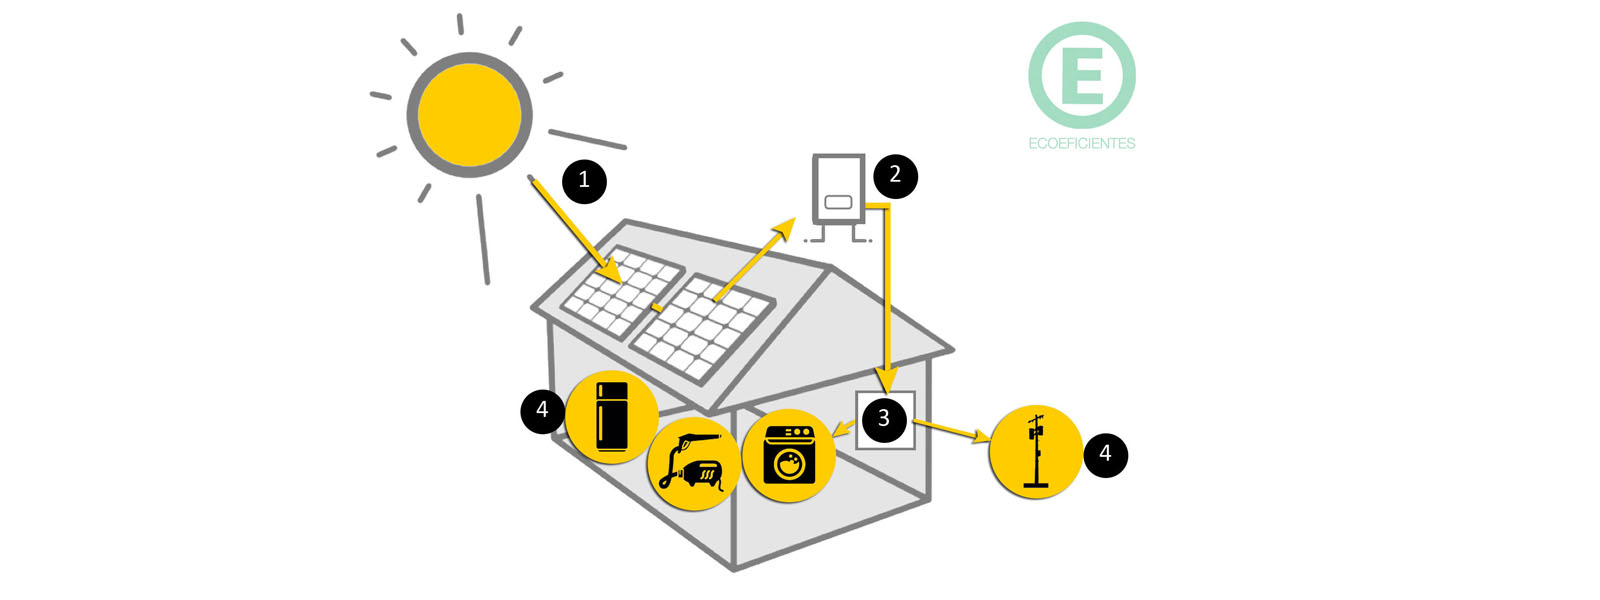 energia-solar-funcionamento-capa